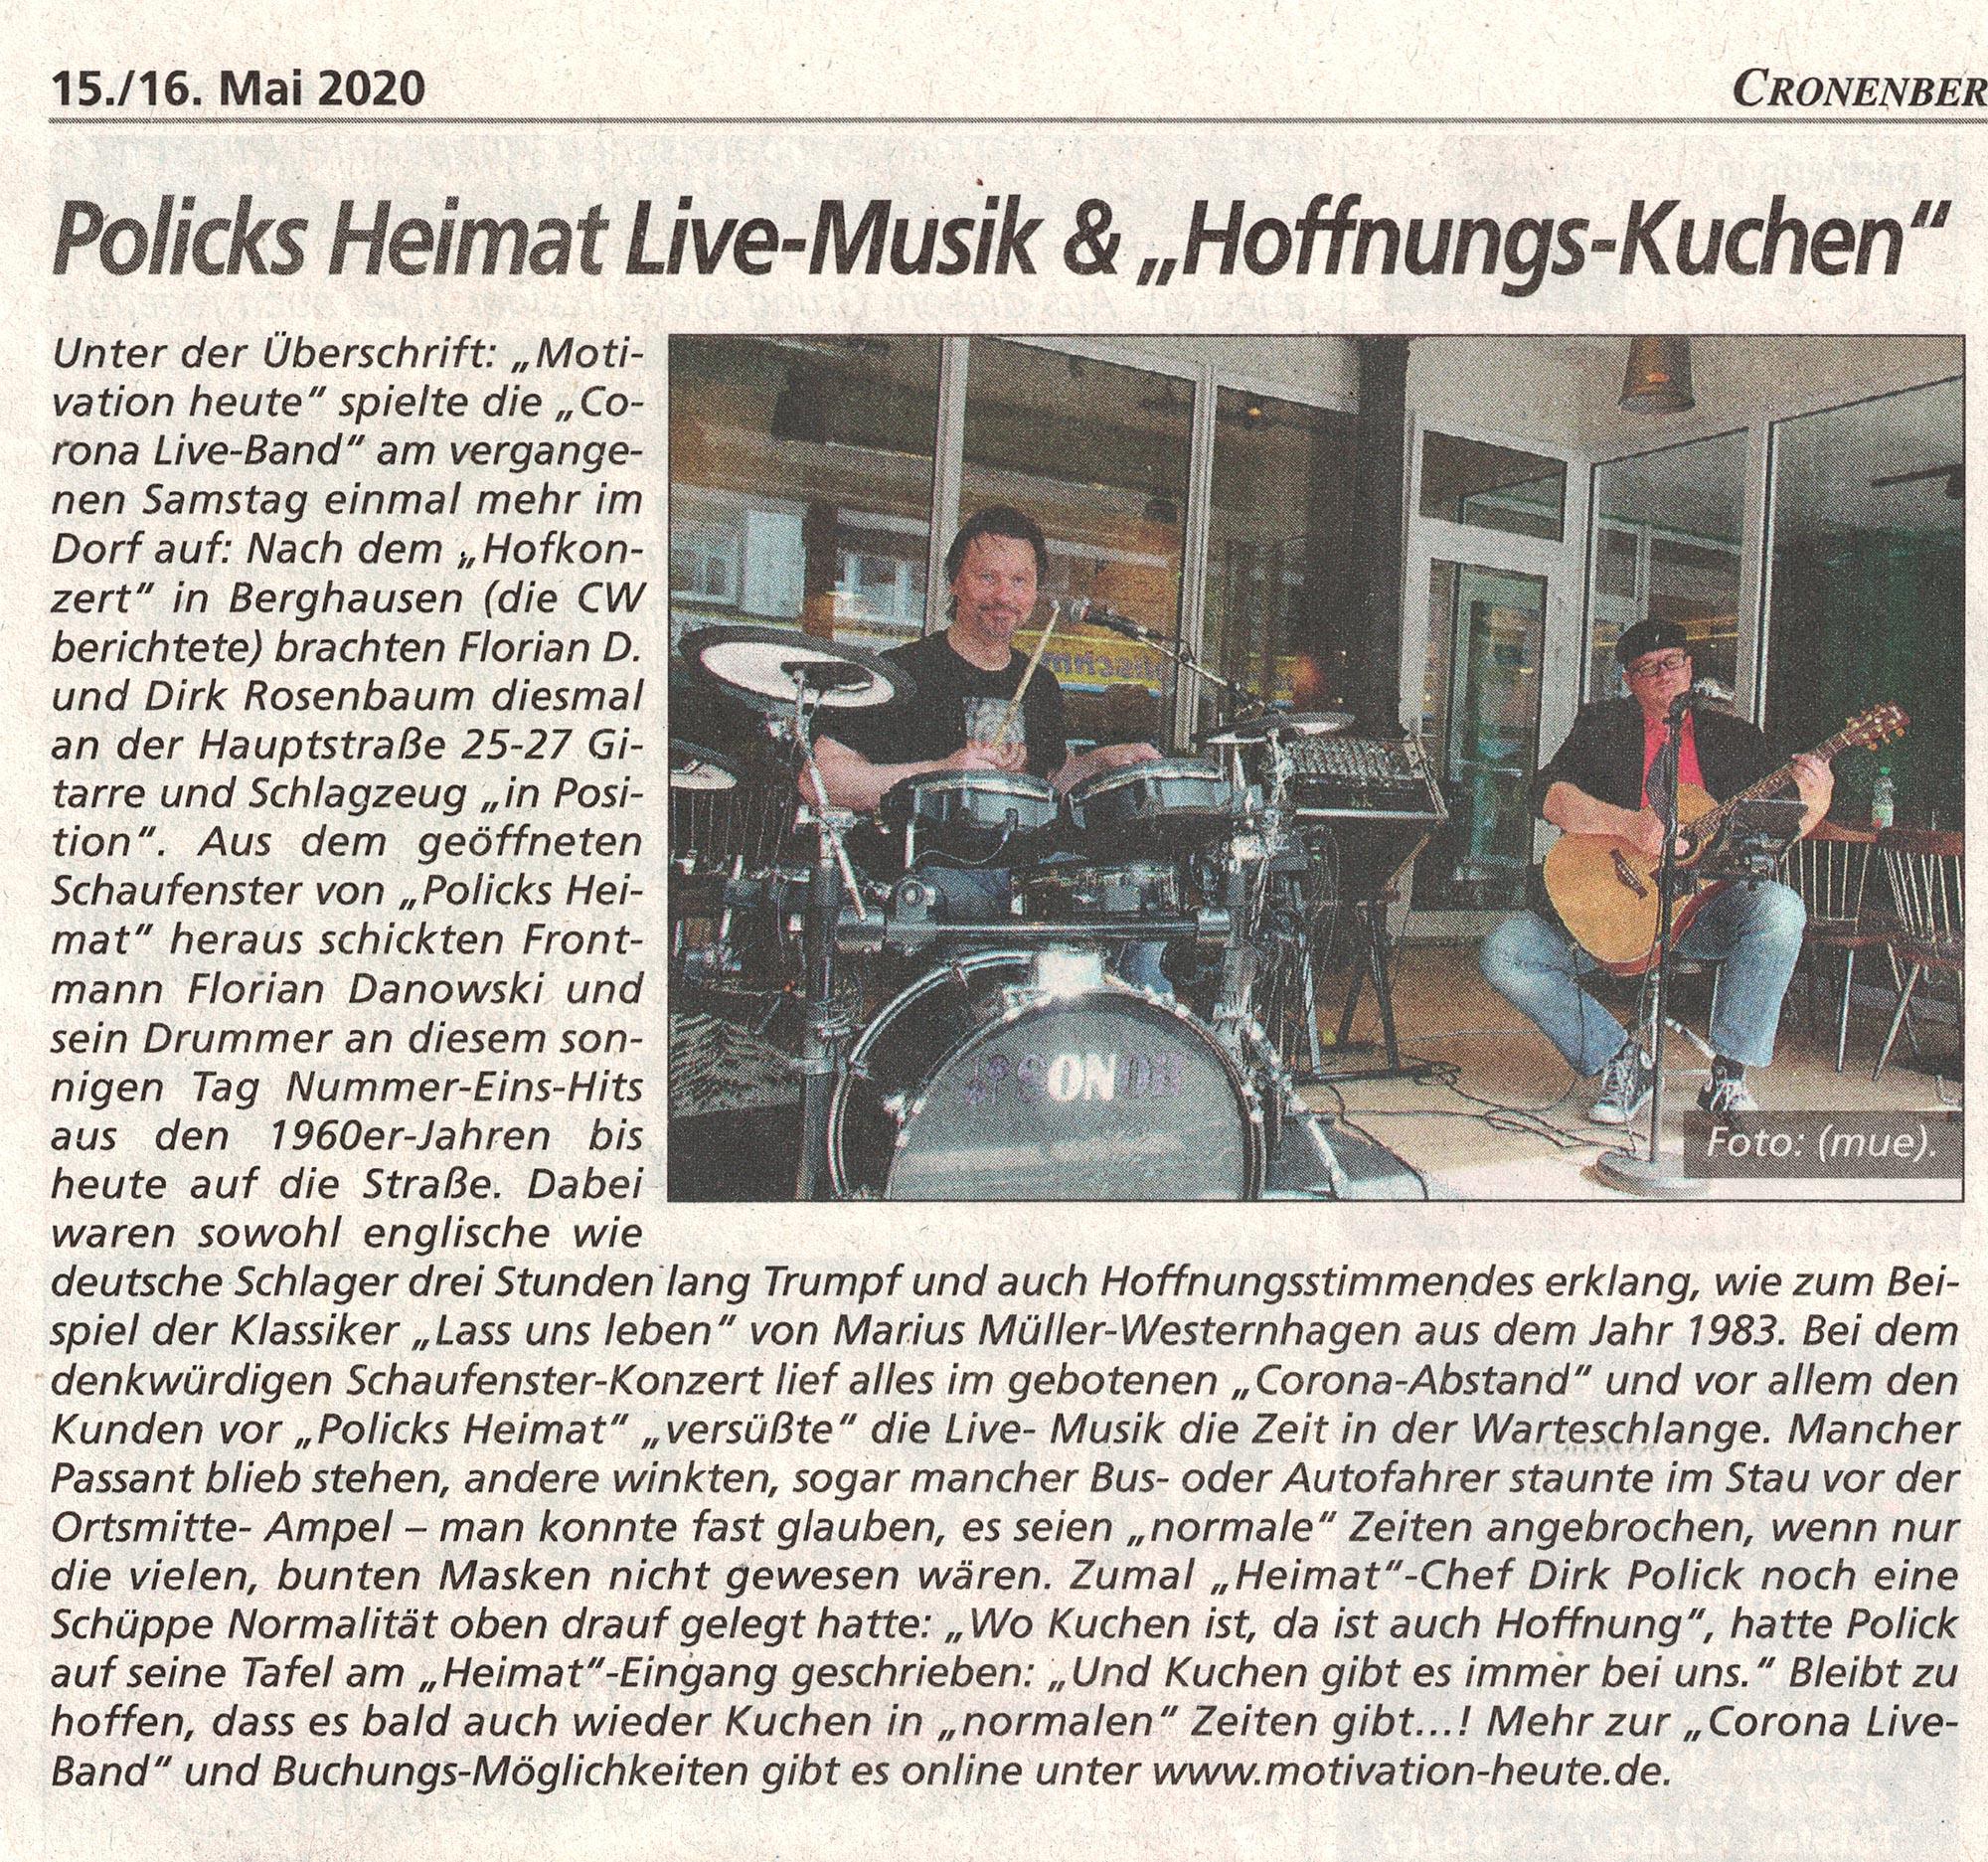 Motivation-heute - Corona Band - Cronenberger Woche 16.05.20